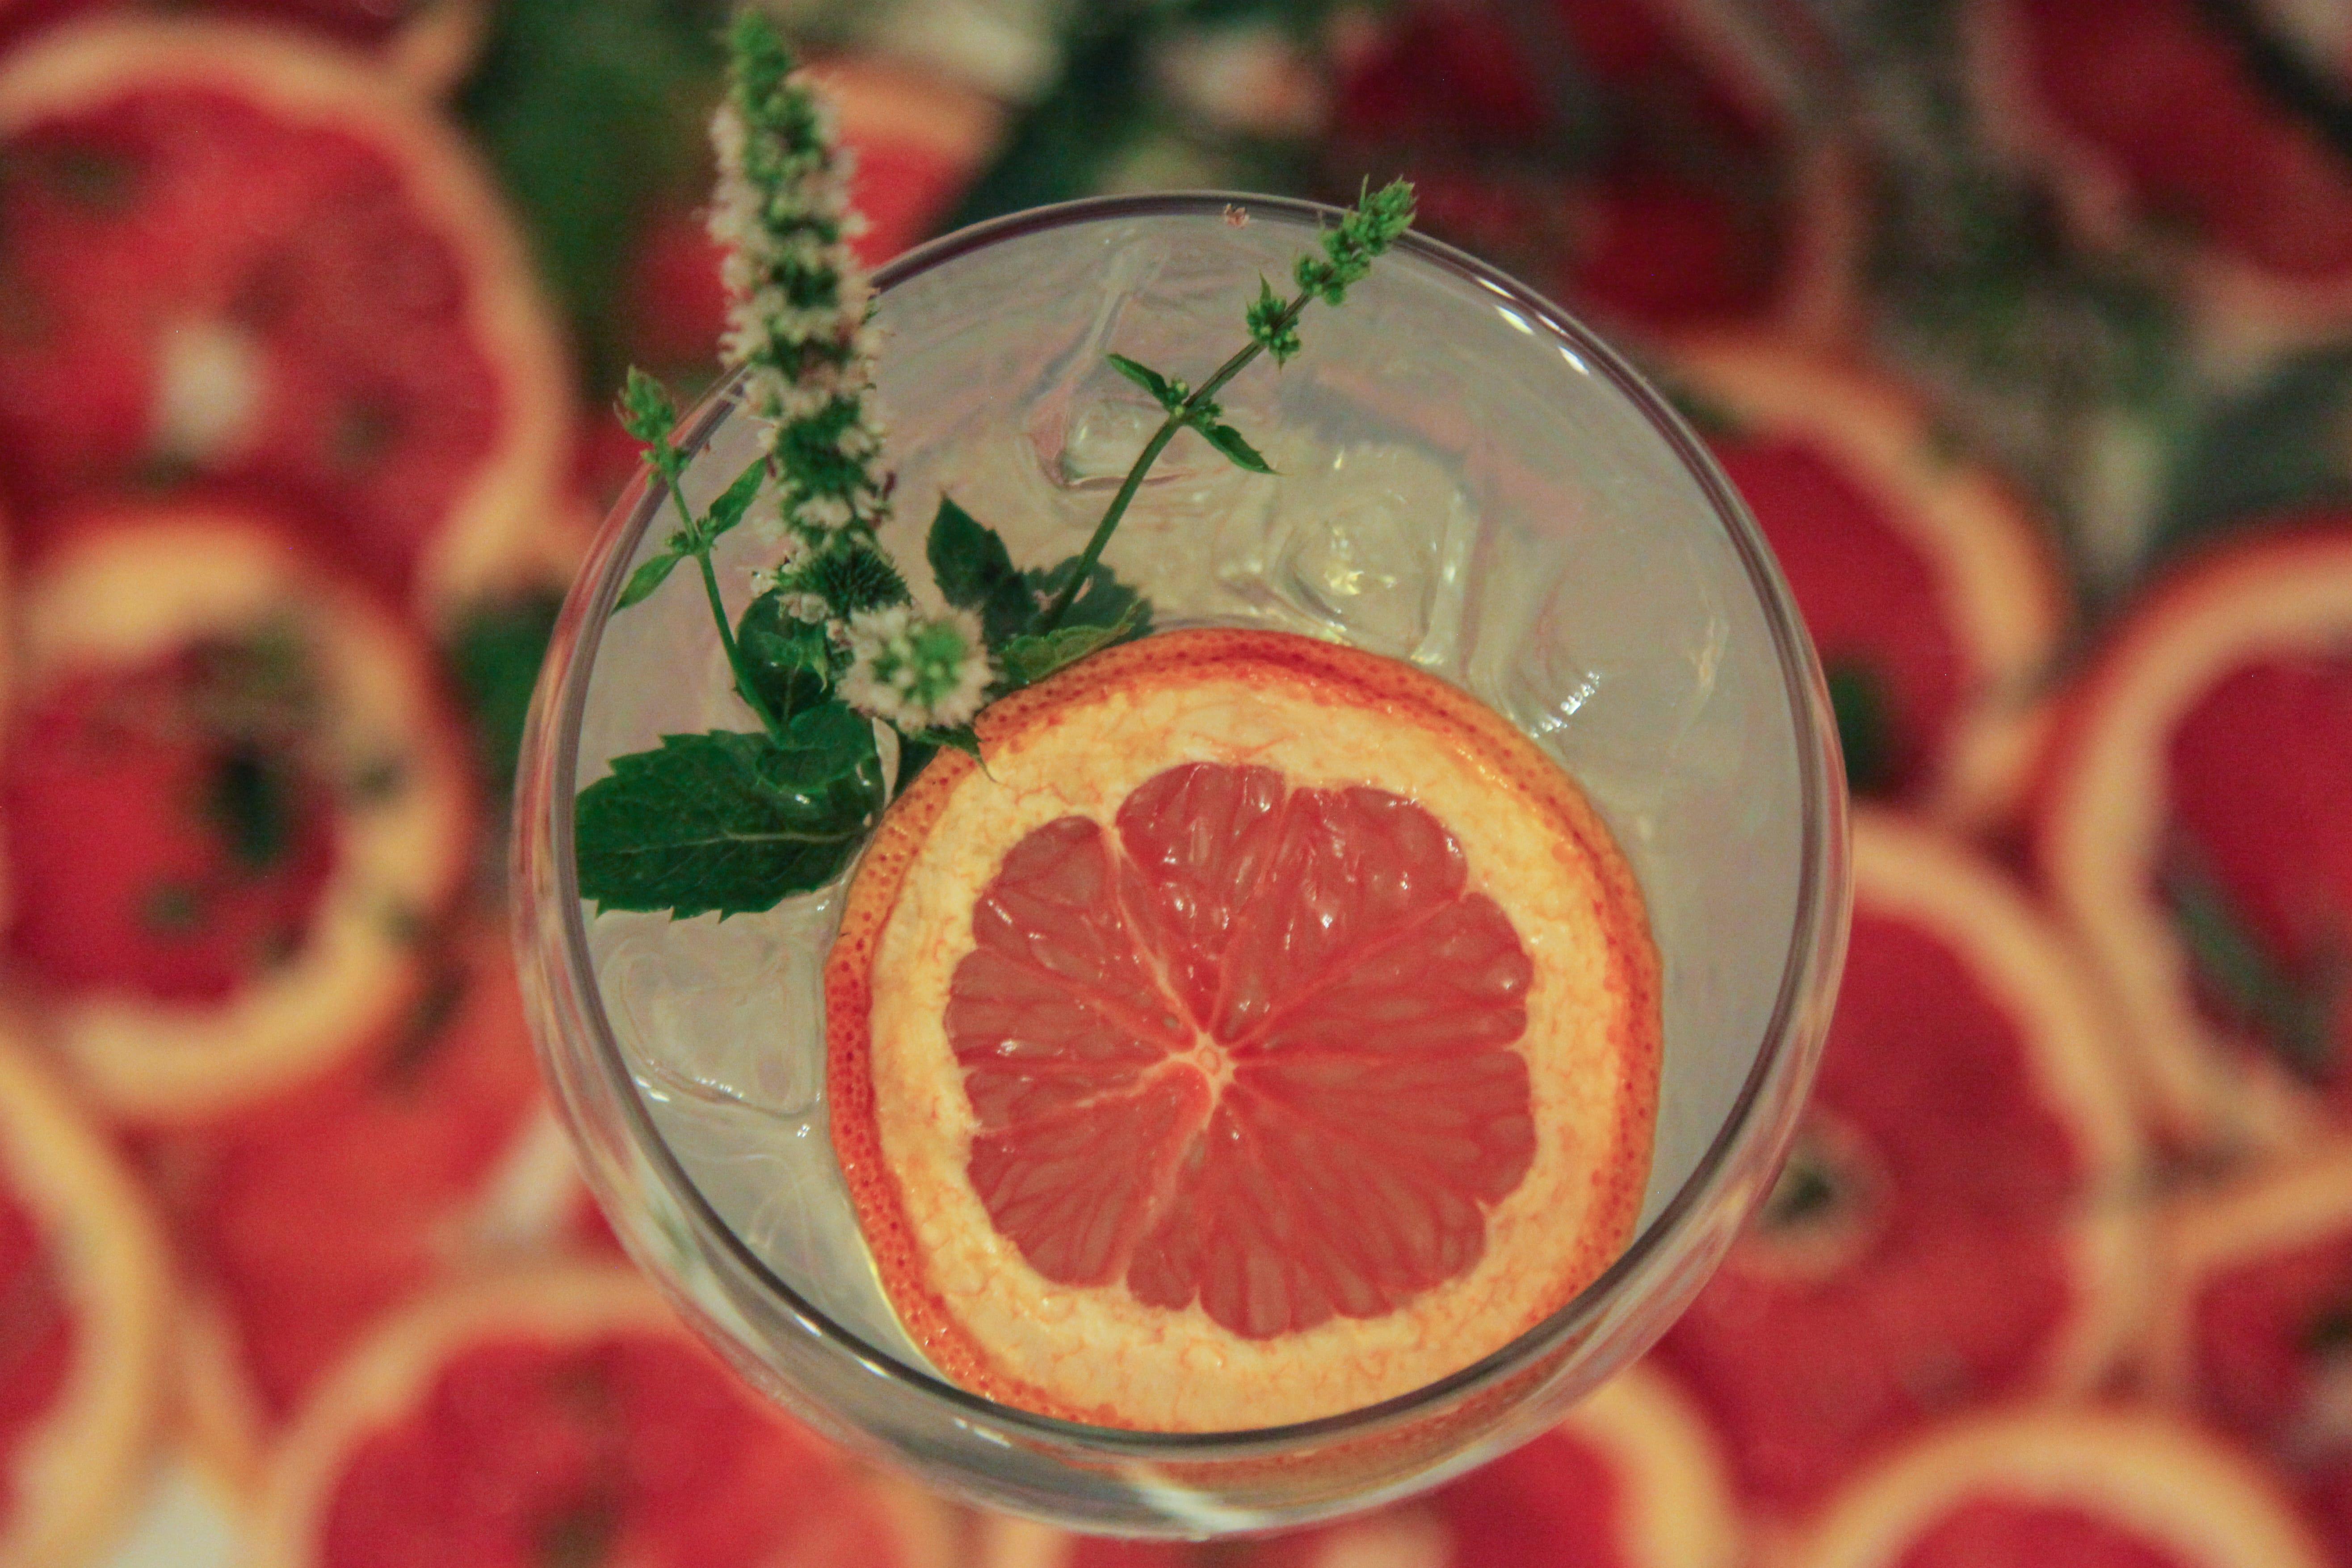 Pickles gin grapefruit garnish 2 min